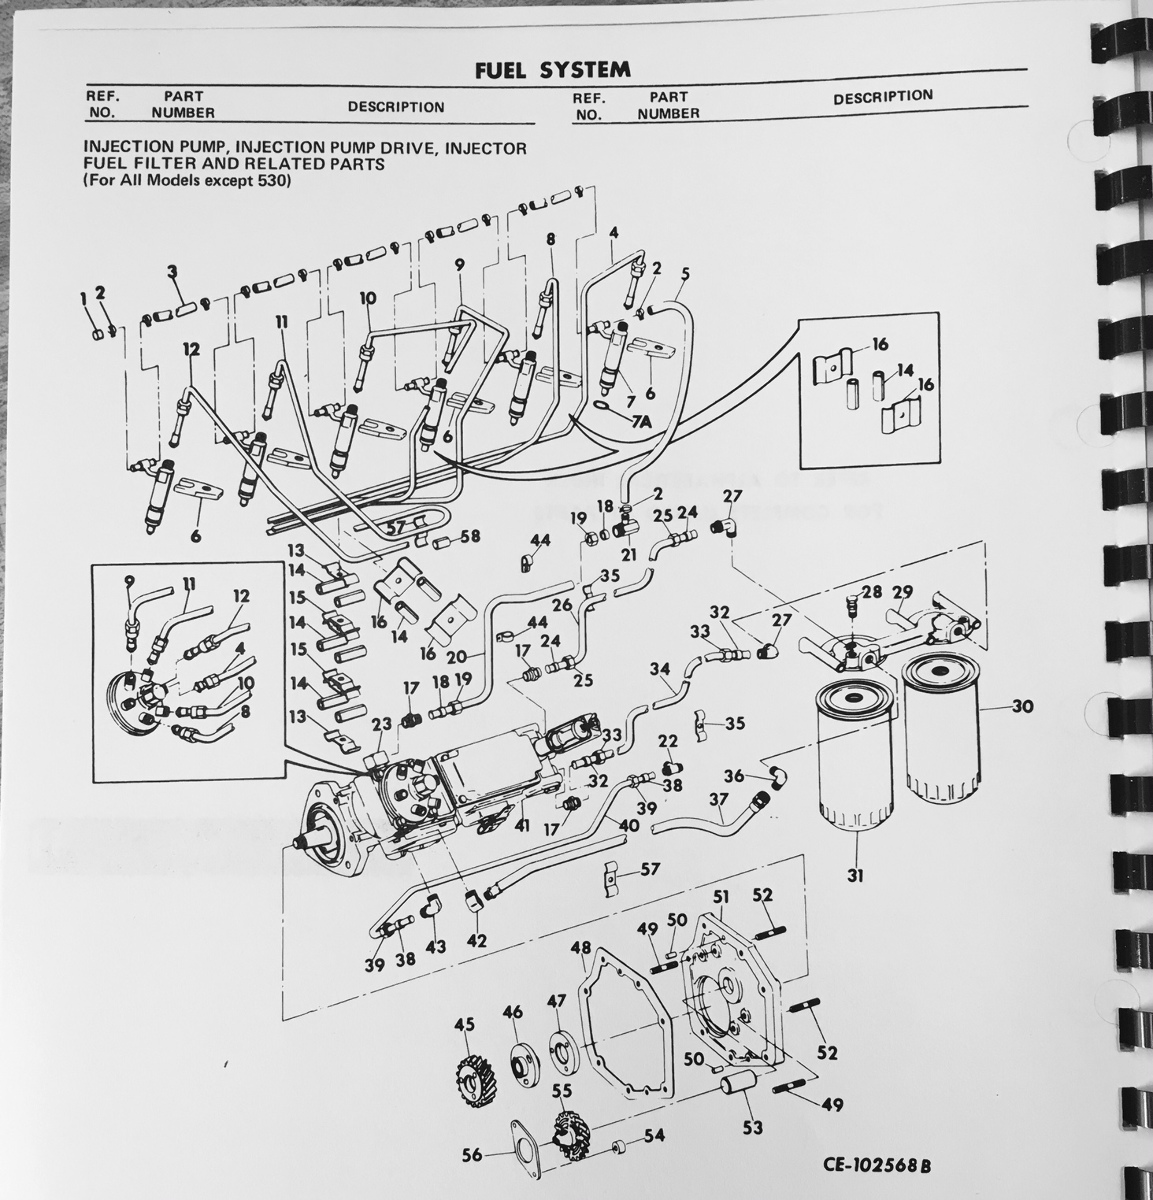 year 1978 make model transtar color red/white year diagram further gmc  sierra oxygen sensor wiring diagram moreover freightliner also freightliner  cascadia